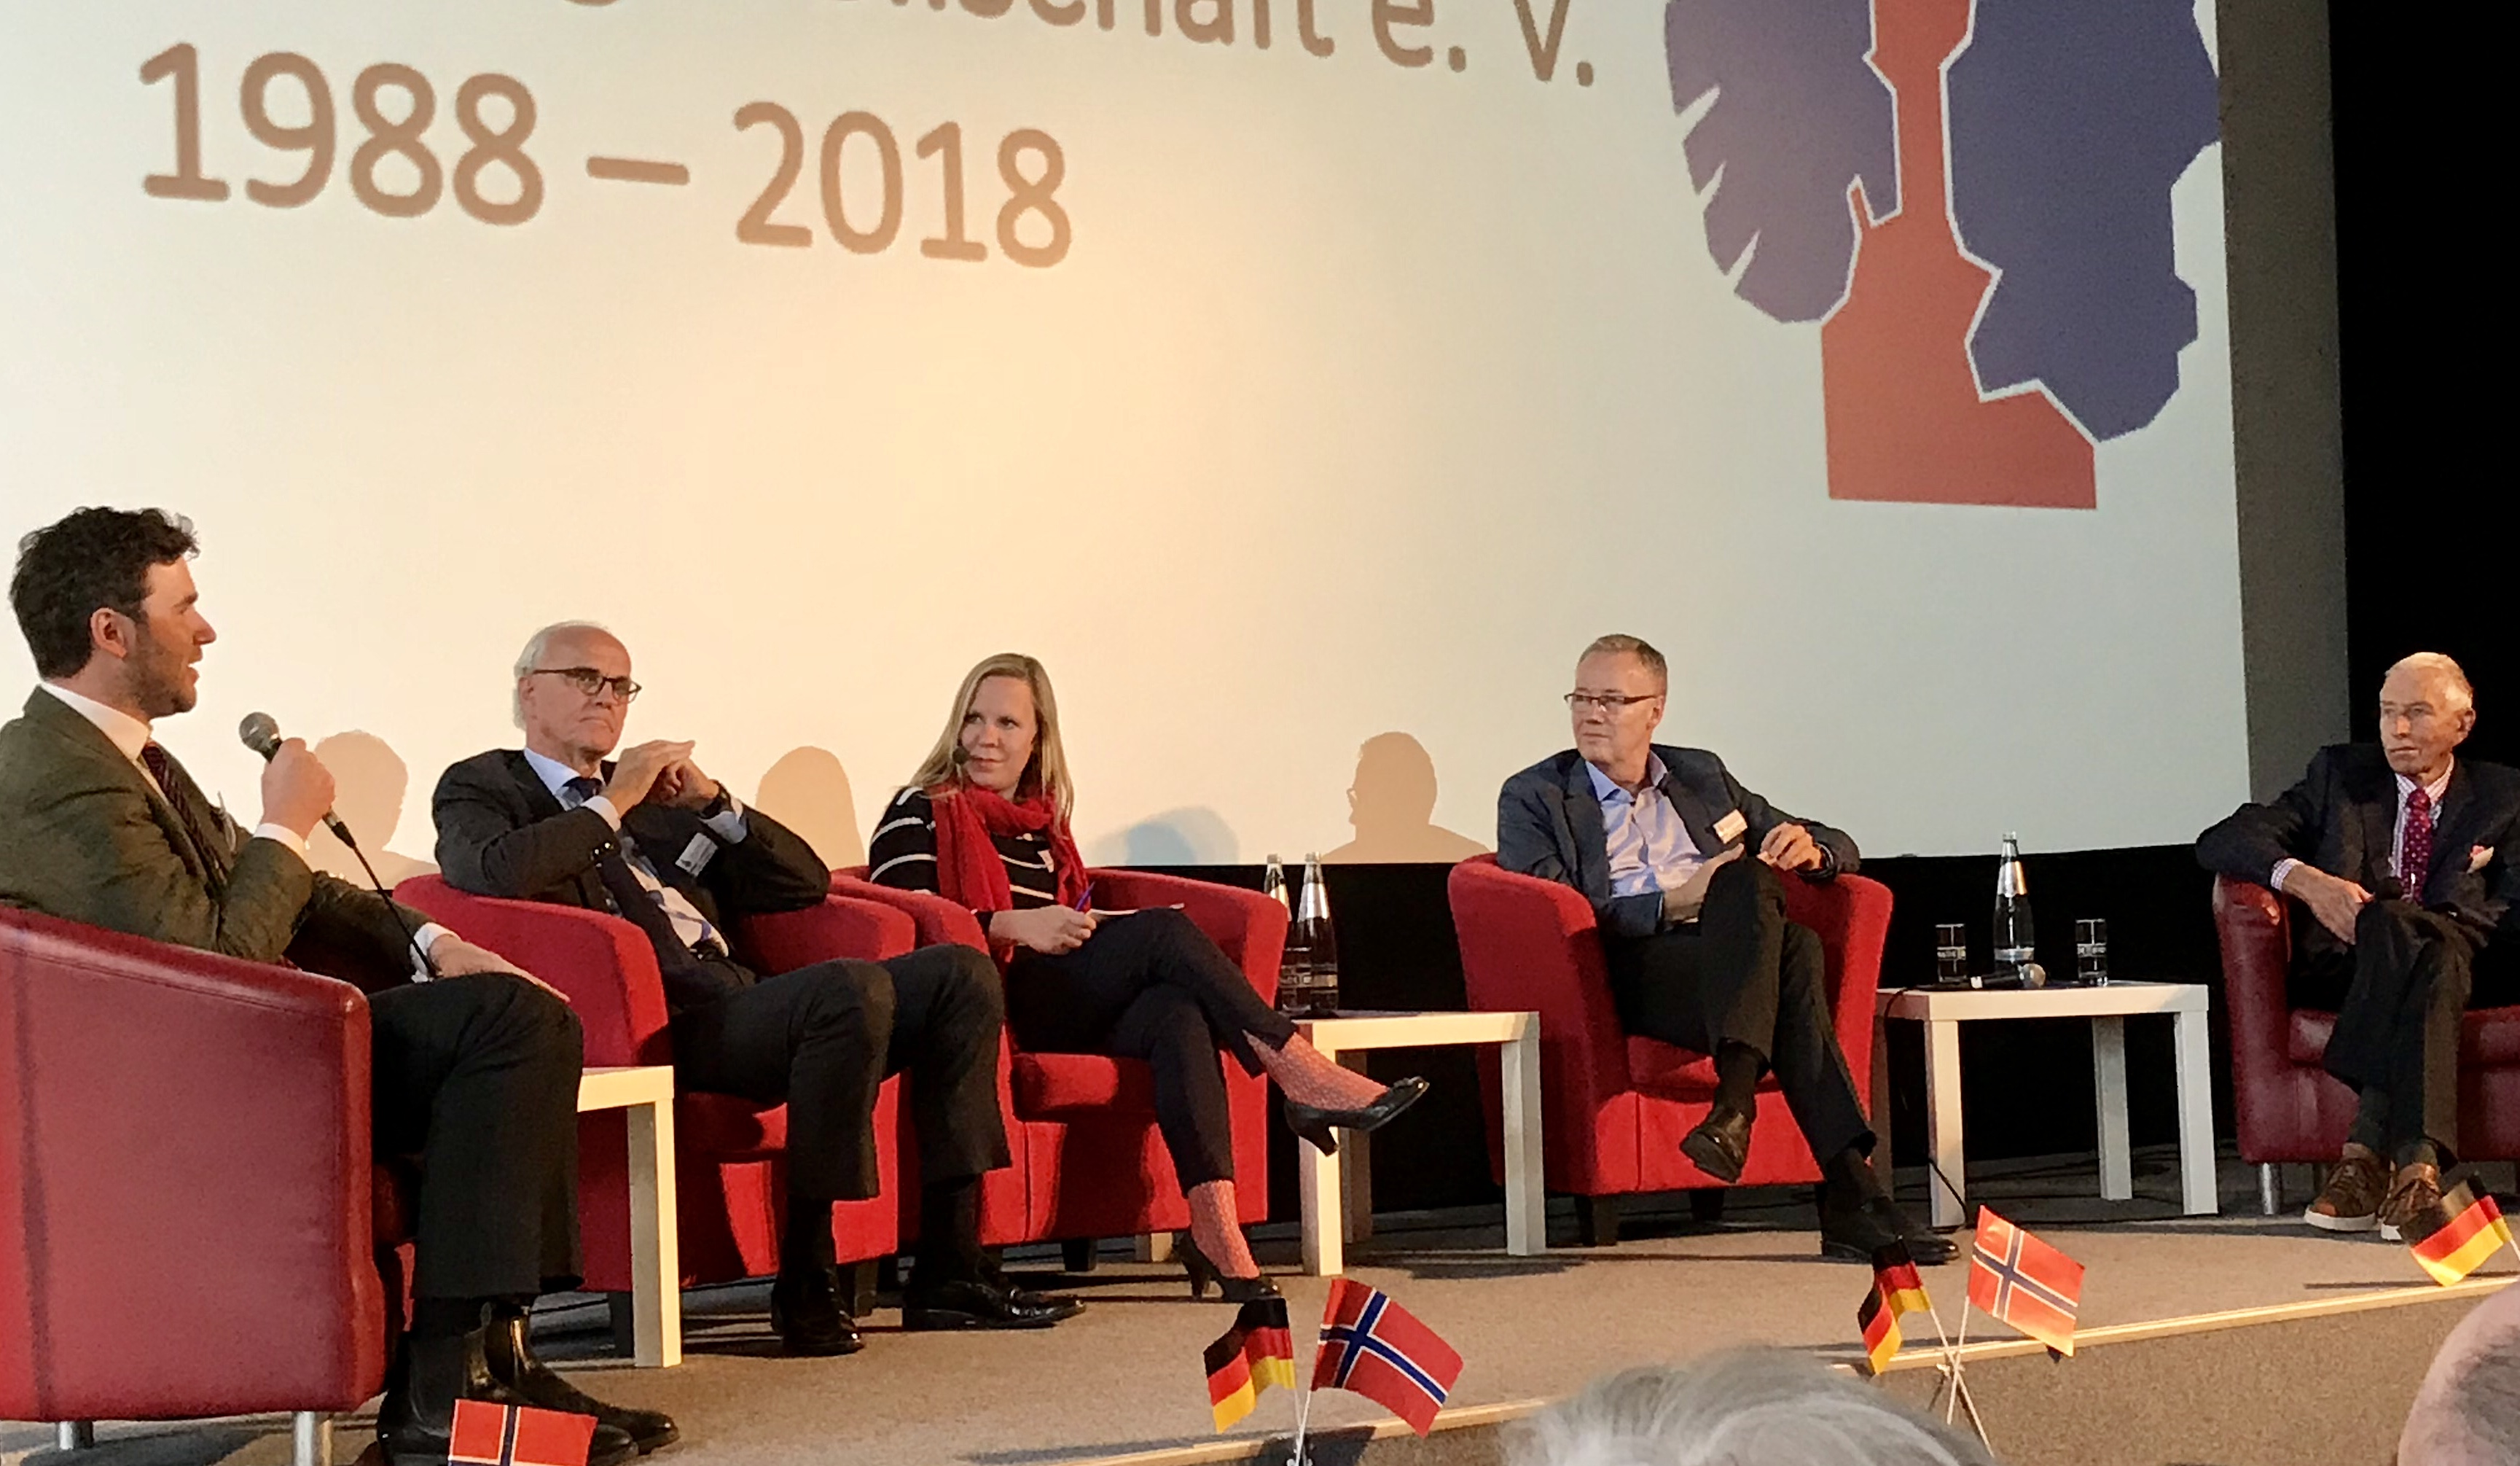 Teilnehmer der Diskussionsrunde, v.l.: Johann R. Leiss, Axel Berg, ModeratorinJulia Stöber, Petter Ølberg und Herbert Brande©DNF